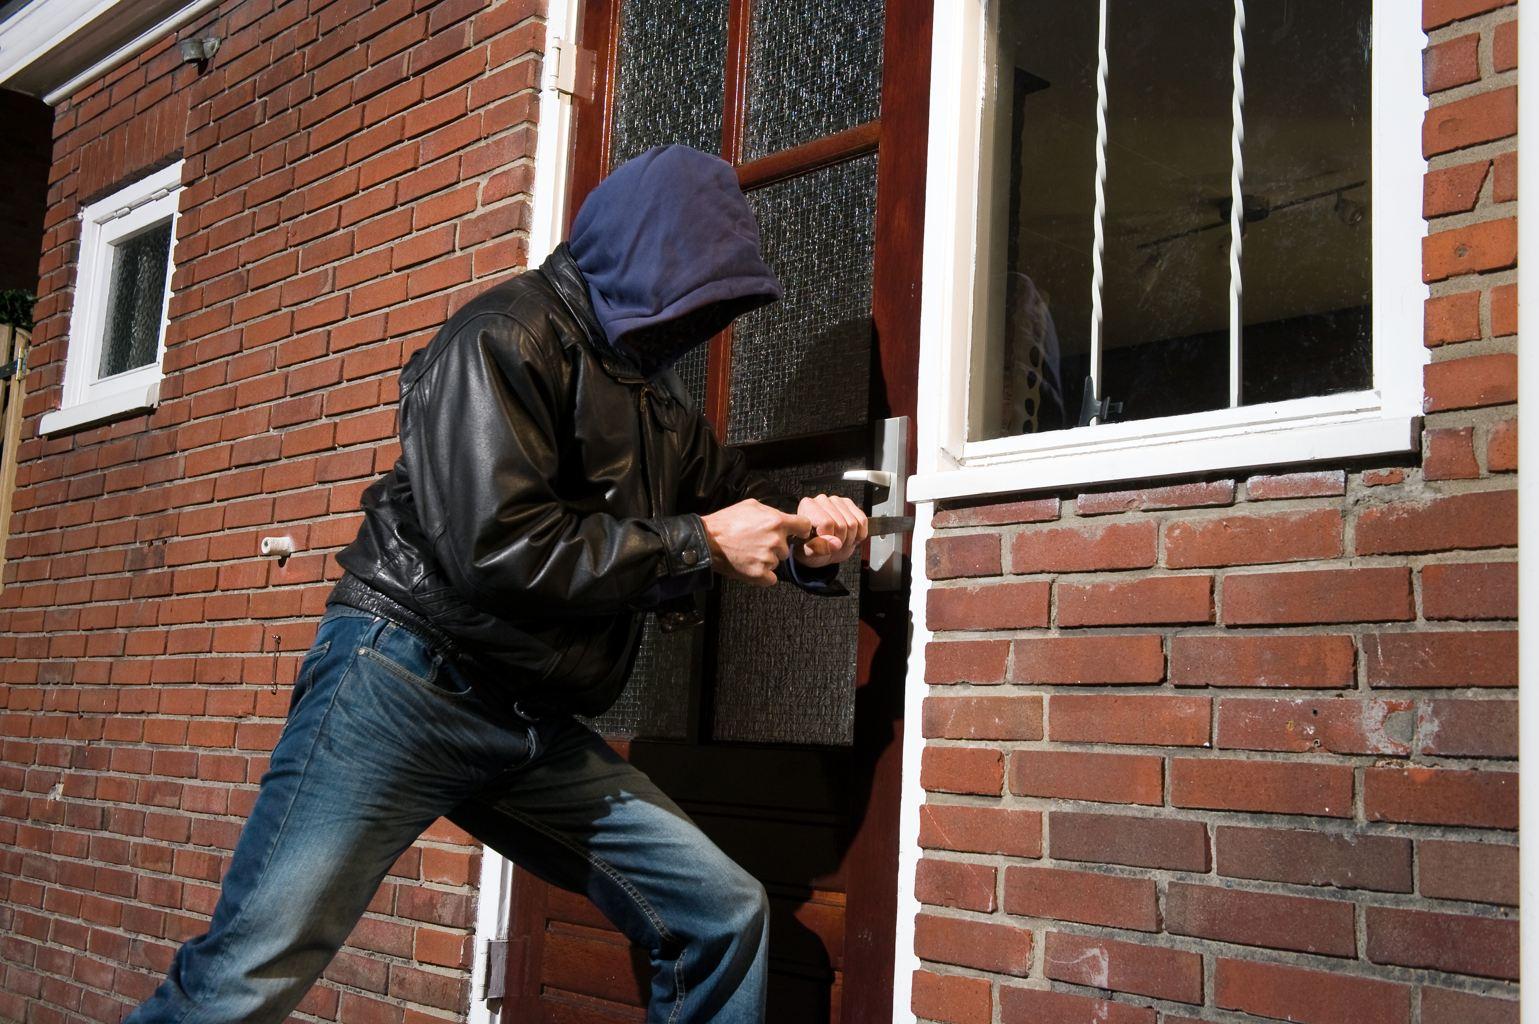 burglaries with euro lock cylinders